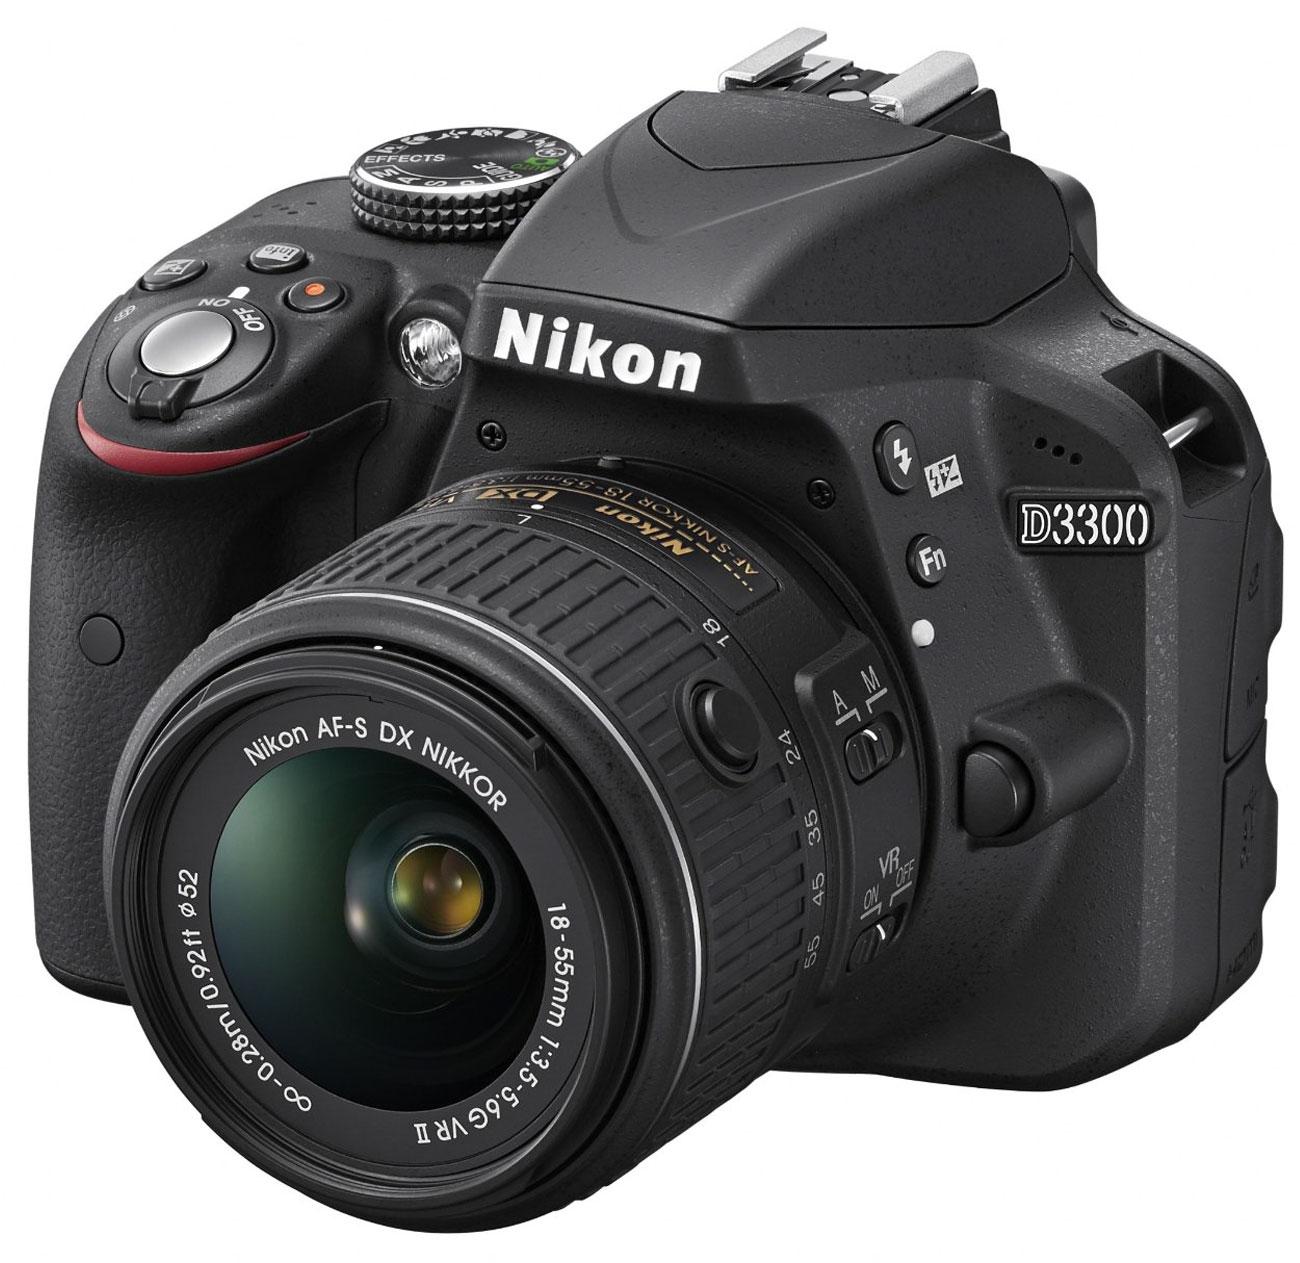 Image for Nikon D3300 24.2MP DSLR Camera With 18-55mm VR Lens Kit